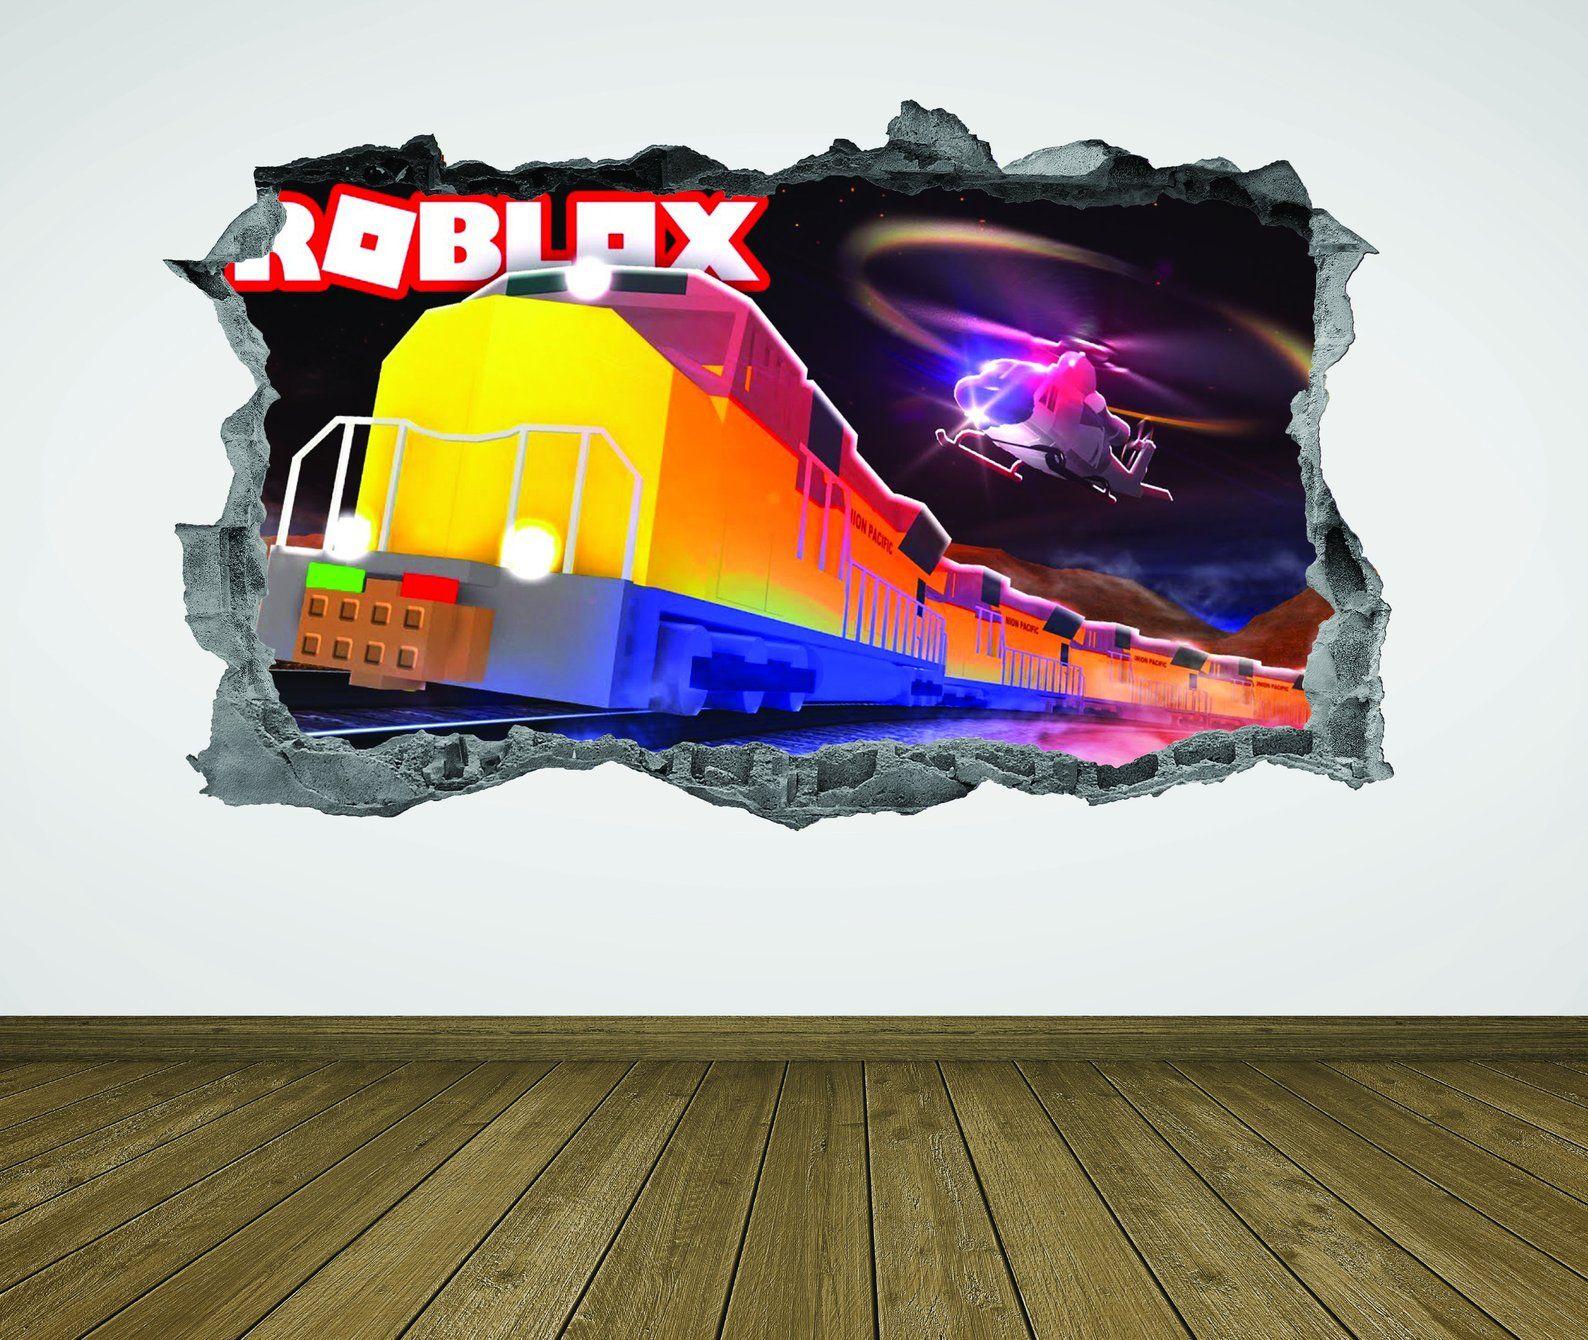 Roblox,Wall Decal,Roblox Wall Art,Roblox Decor,3D,Kids,Roblox Stickers,Decal,Murals